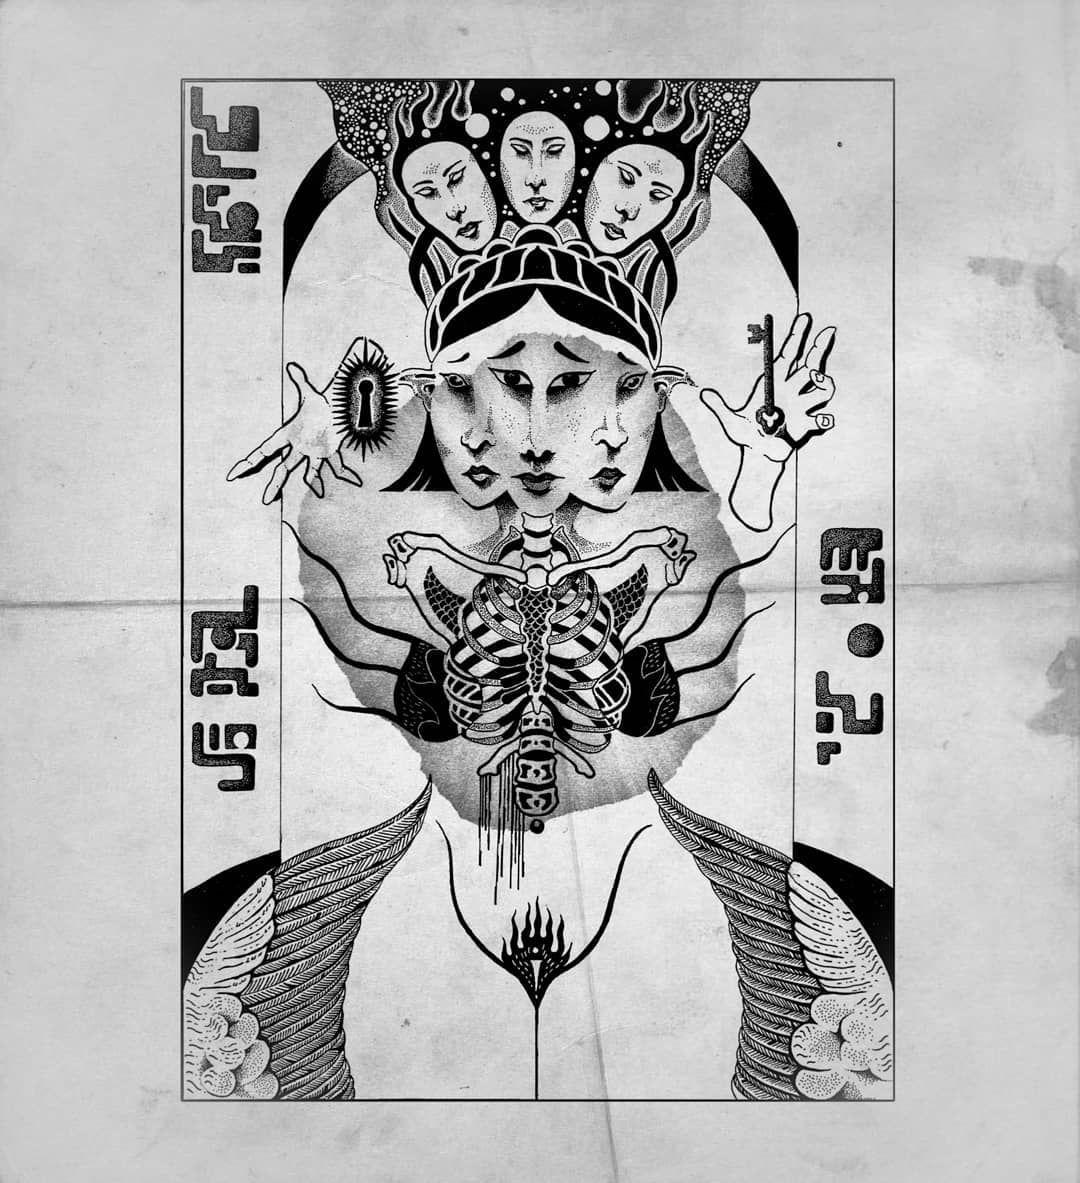 Variable prediction for only unknown (pen&crayon). . #blackworknow #iblackwork #dotworknow #blackwork #blackworktattoo #artwork #darkart #blackworkillustrations #darkartwork #drawing #illustration #skulltattoo #skullart #penandinkartt #dotworknow #art_dailydose #arts_help #darkillustrations #drawing #sketch